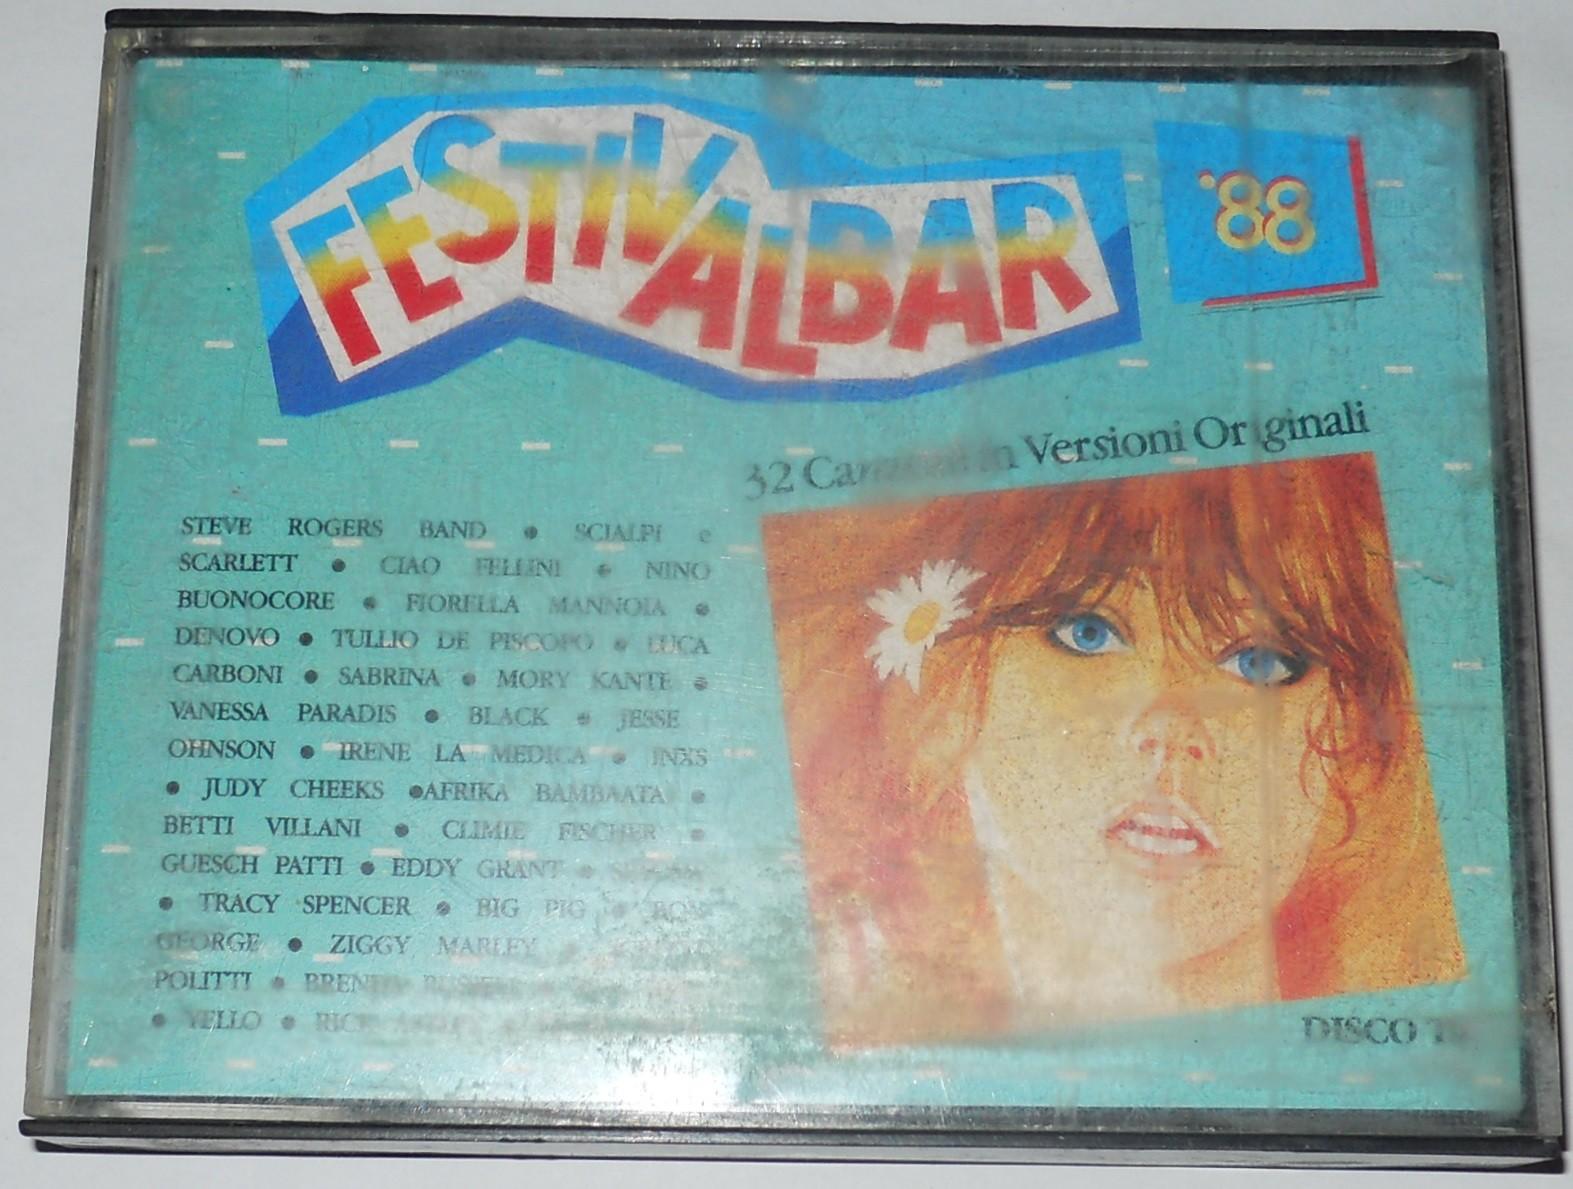 feestivalbar 1988